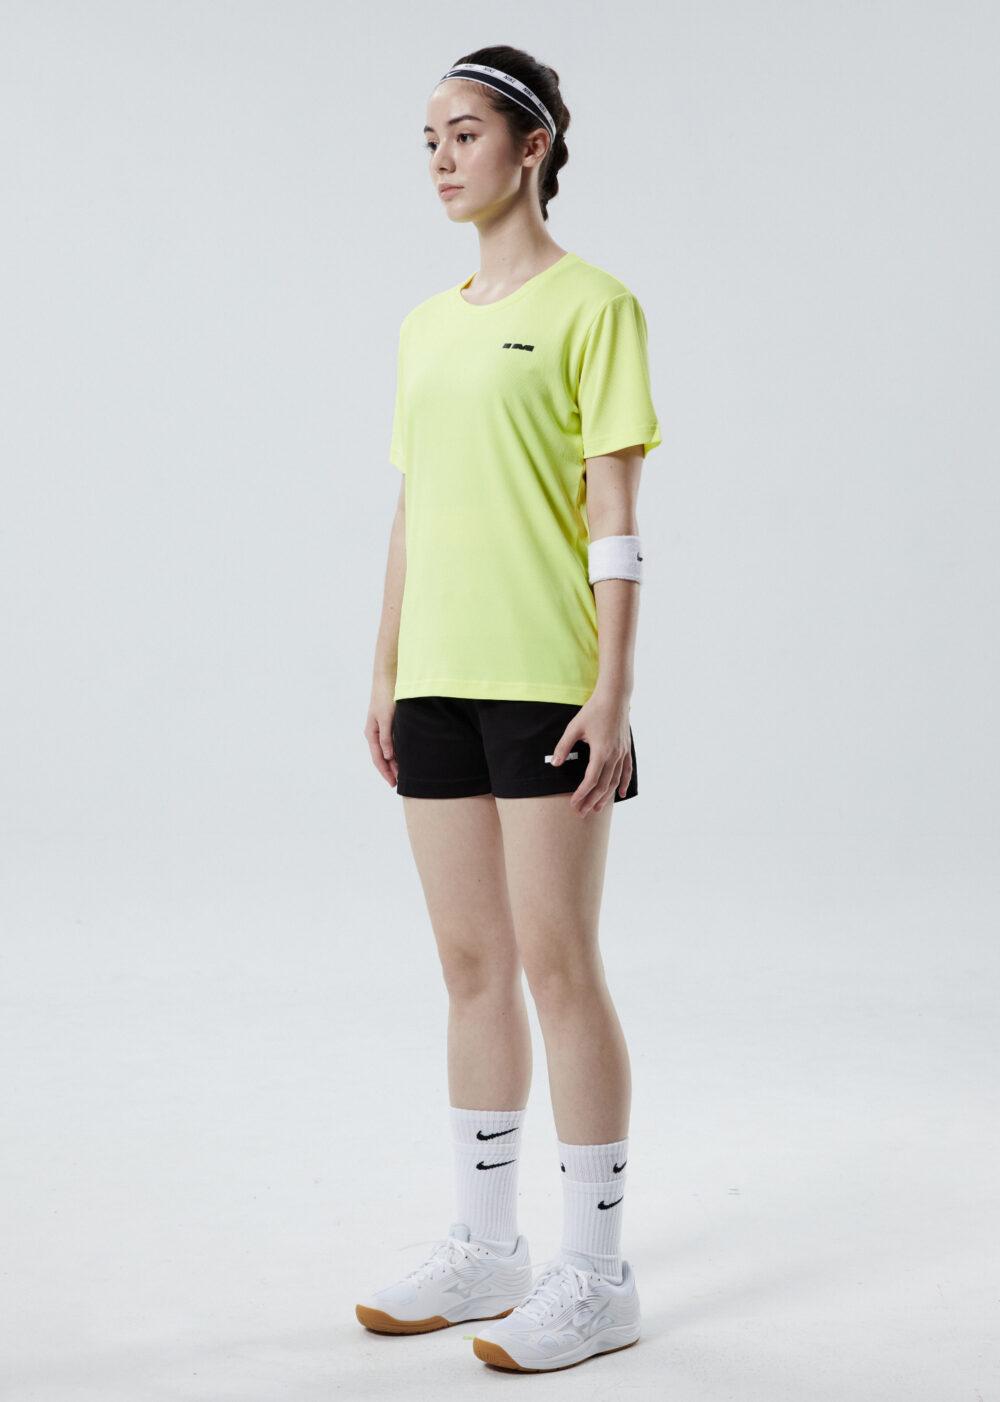 imbc-排球衣-排球服-排球衣設計